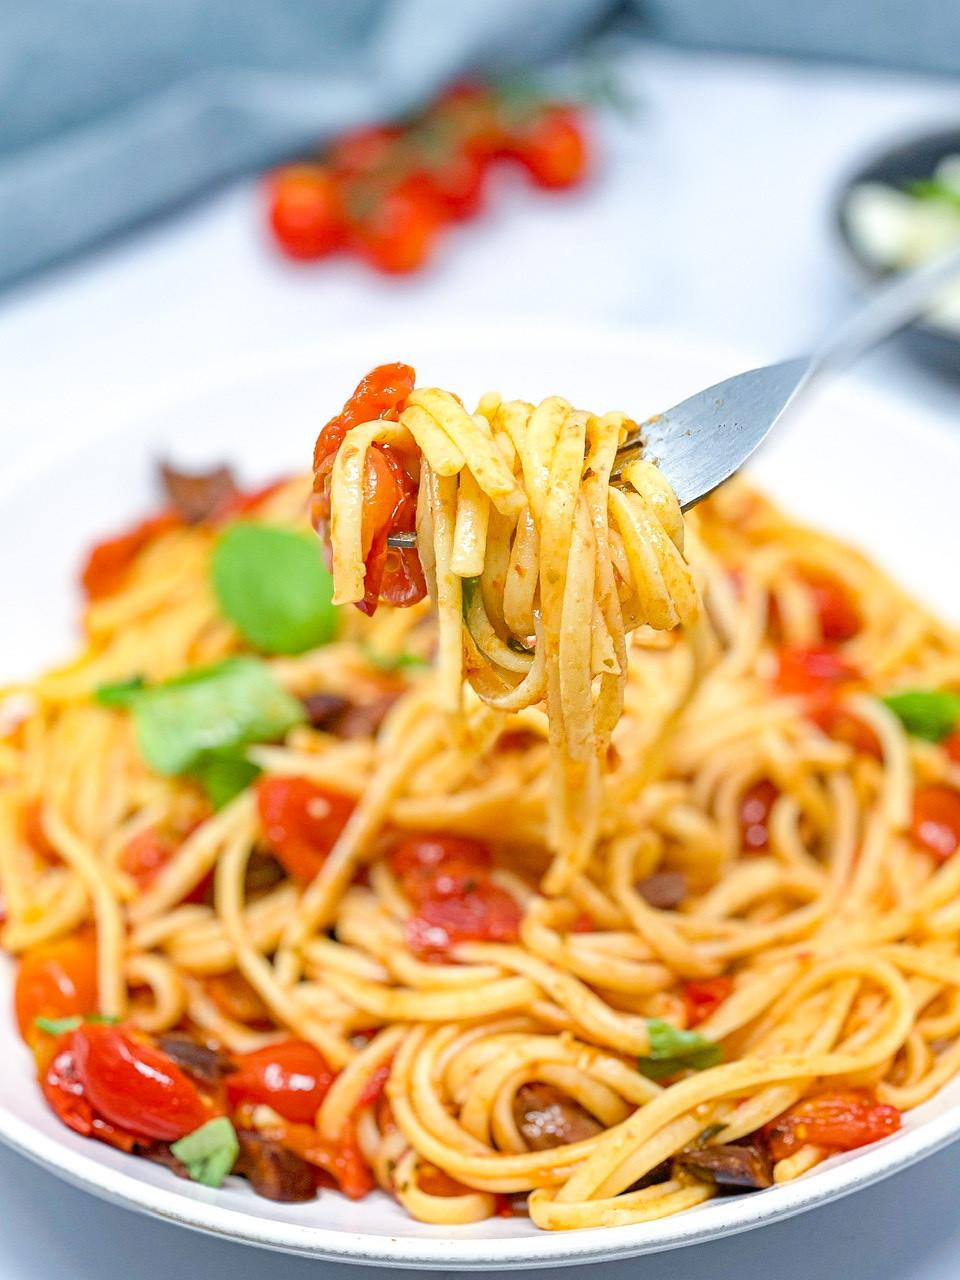 15 MINUTES FRESH TOMATO PASTA in fork